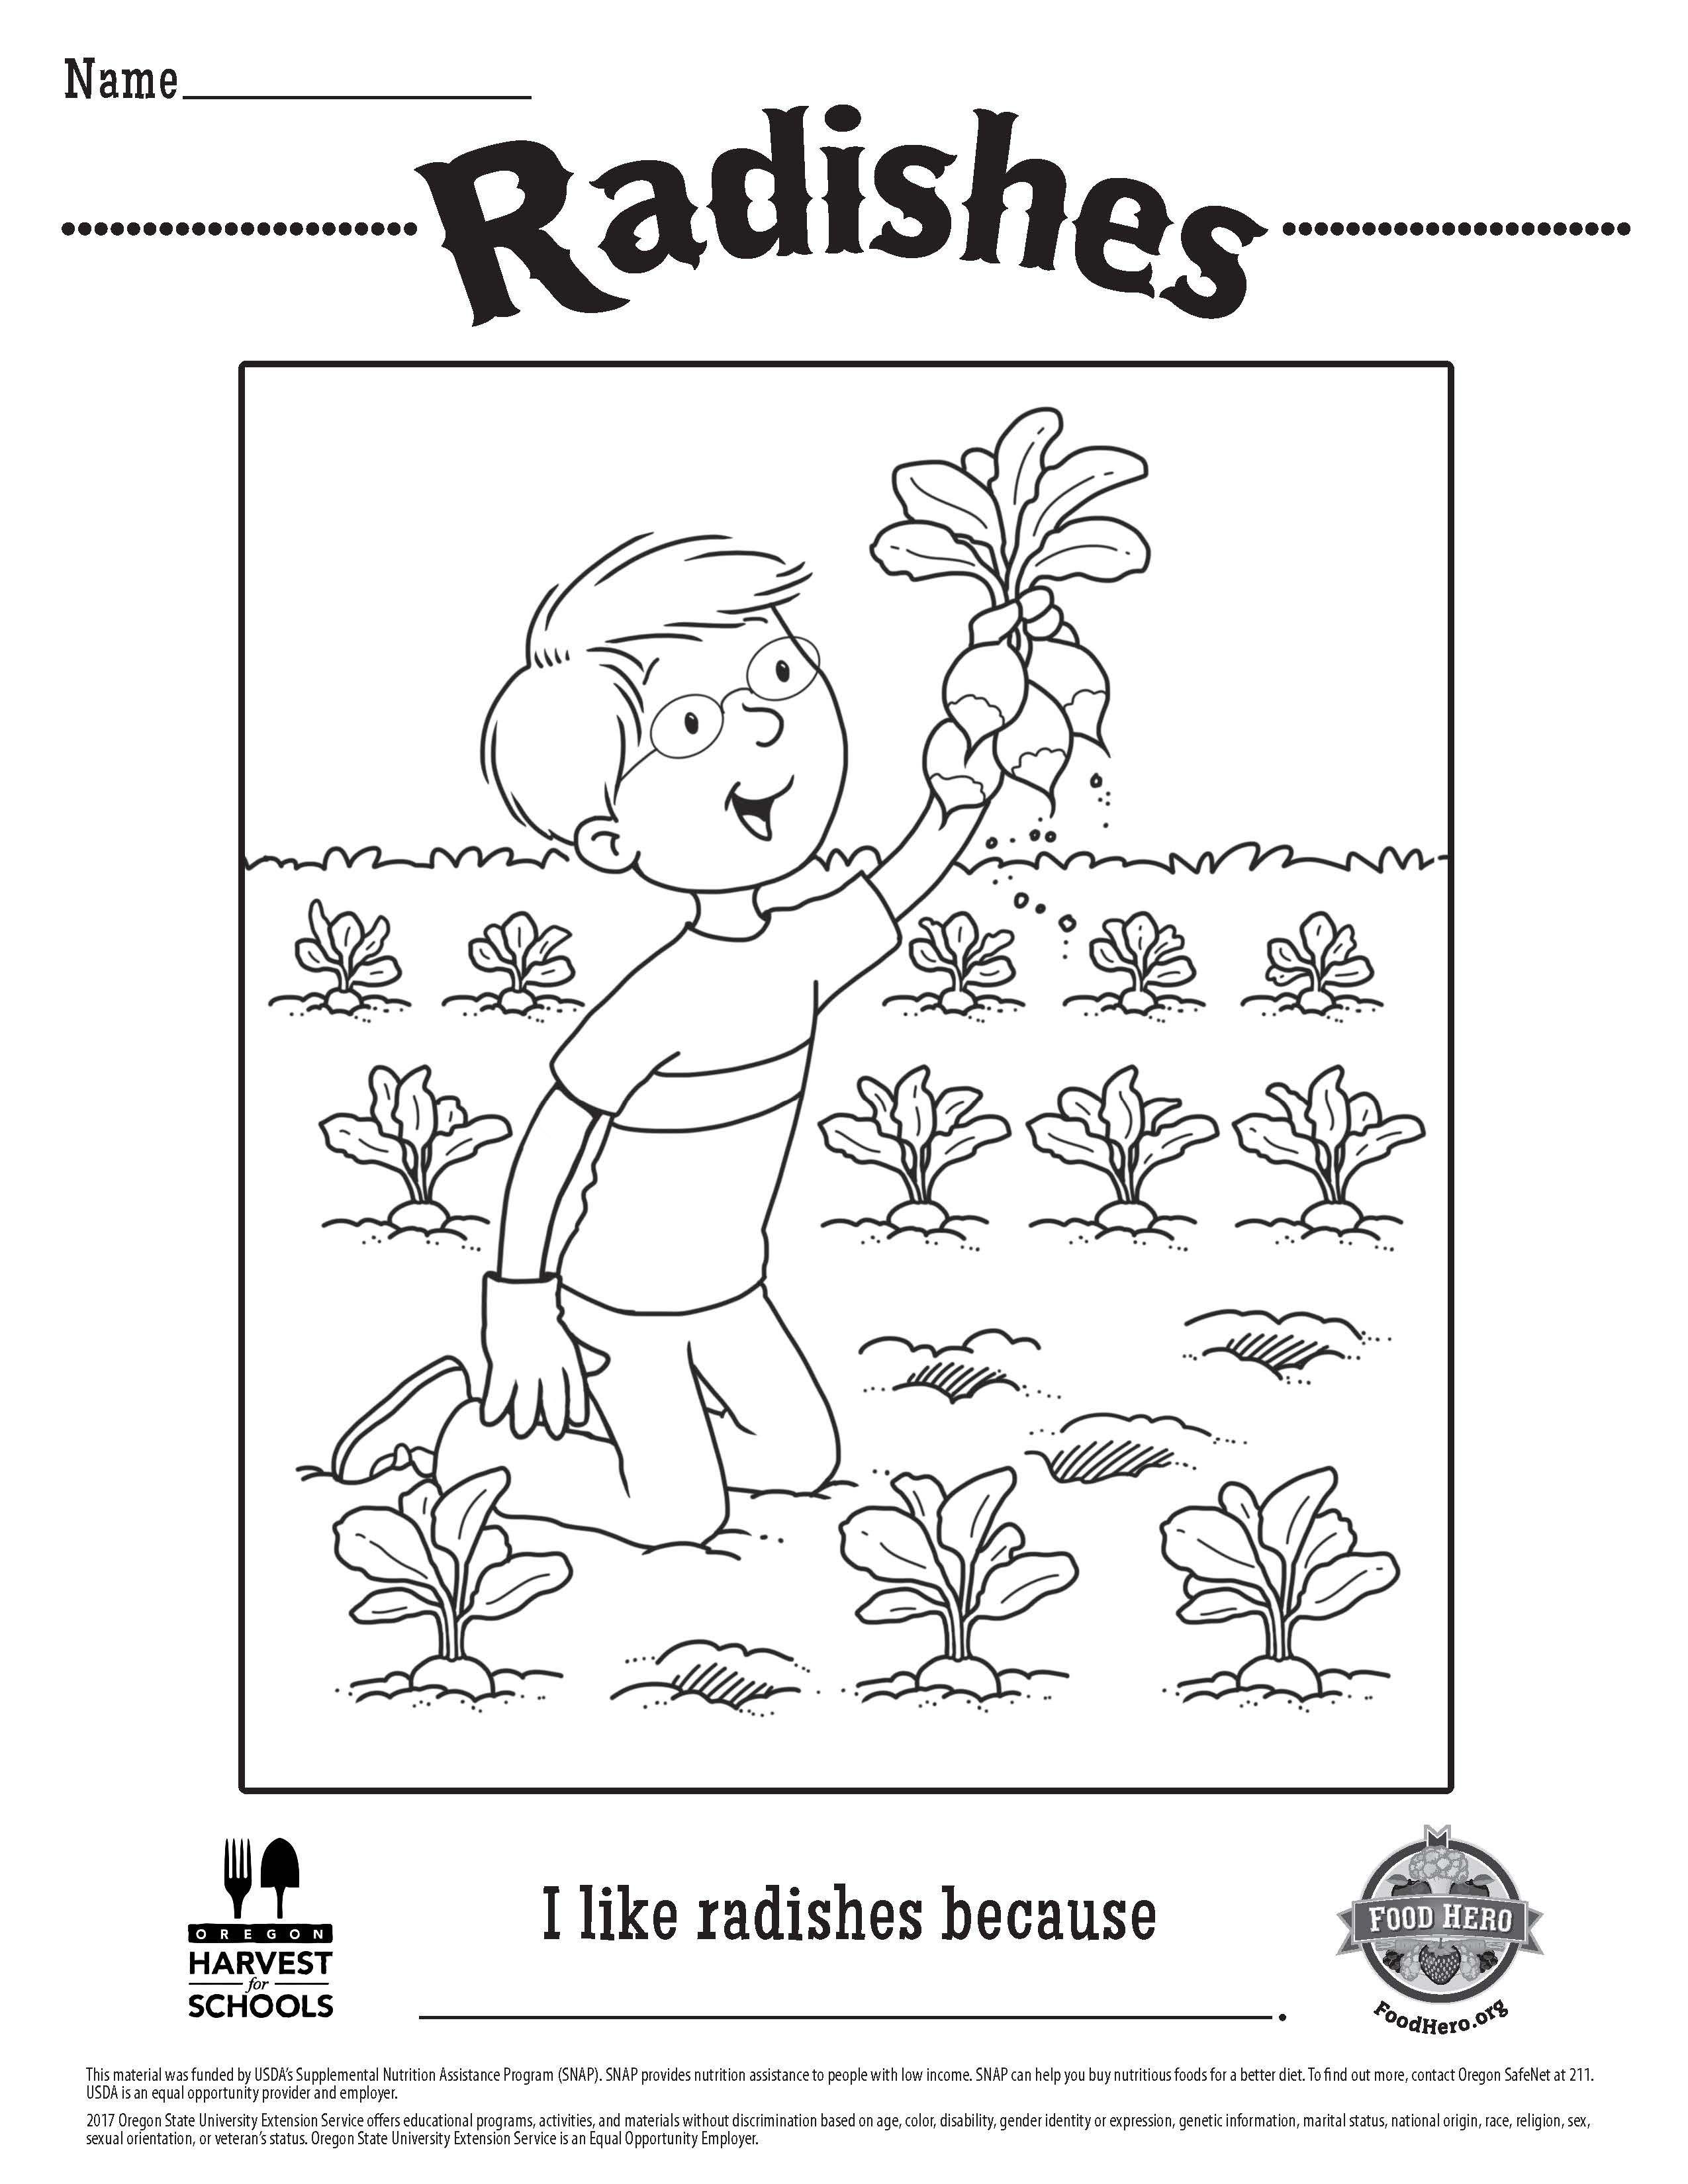 Radishes Food Hero Free Printable Children S Coloring